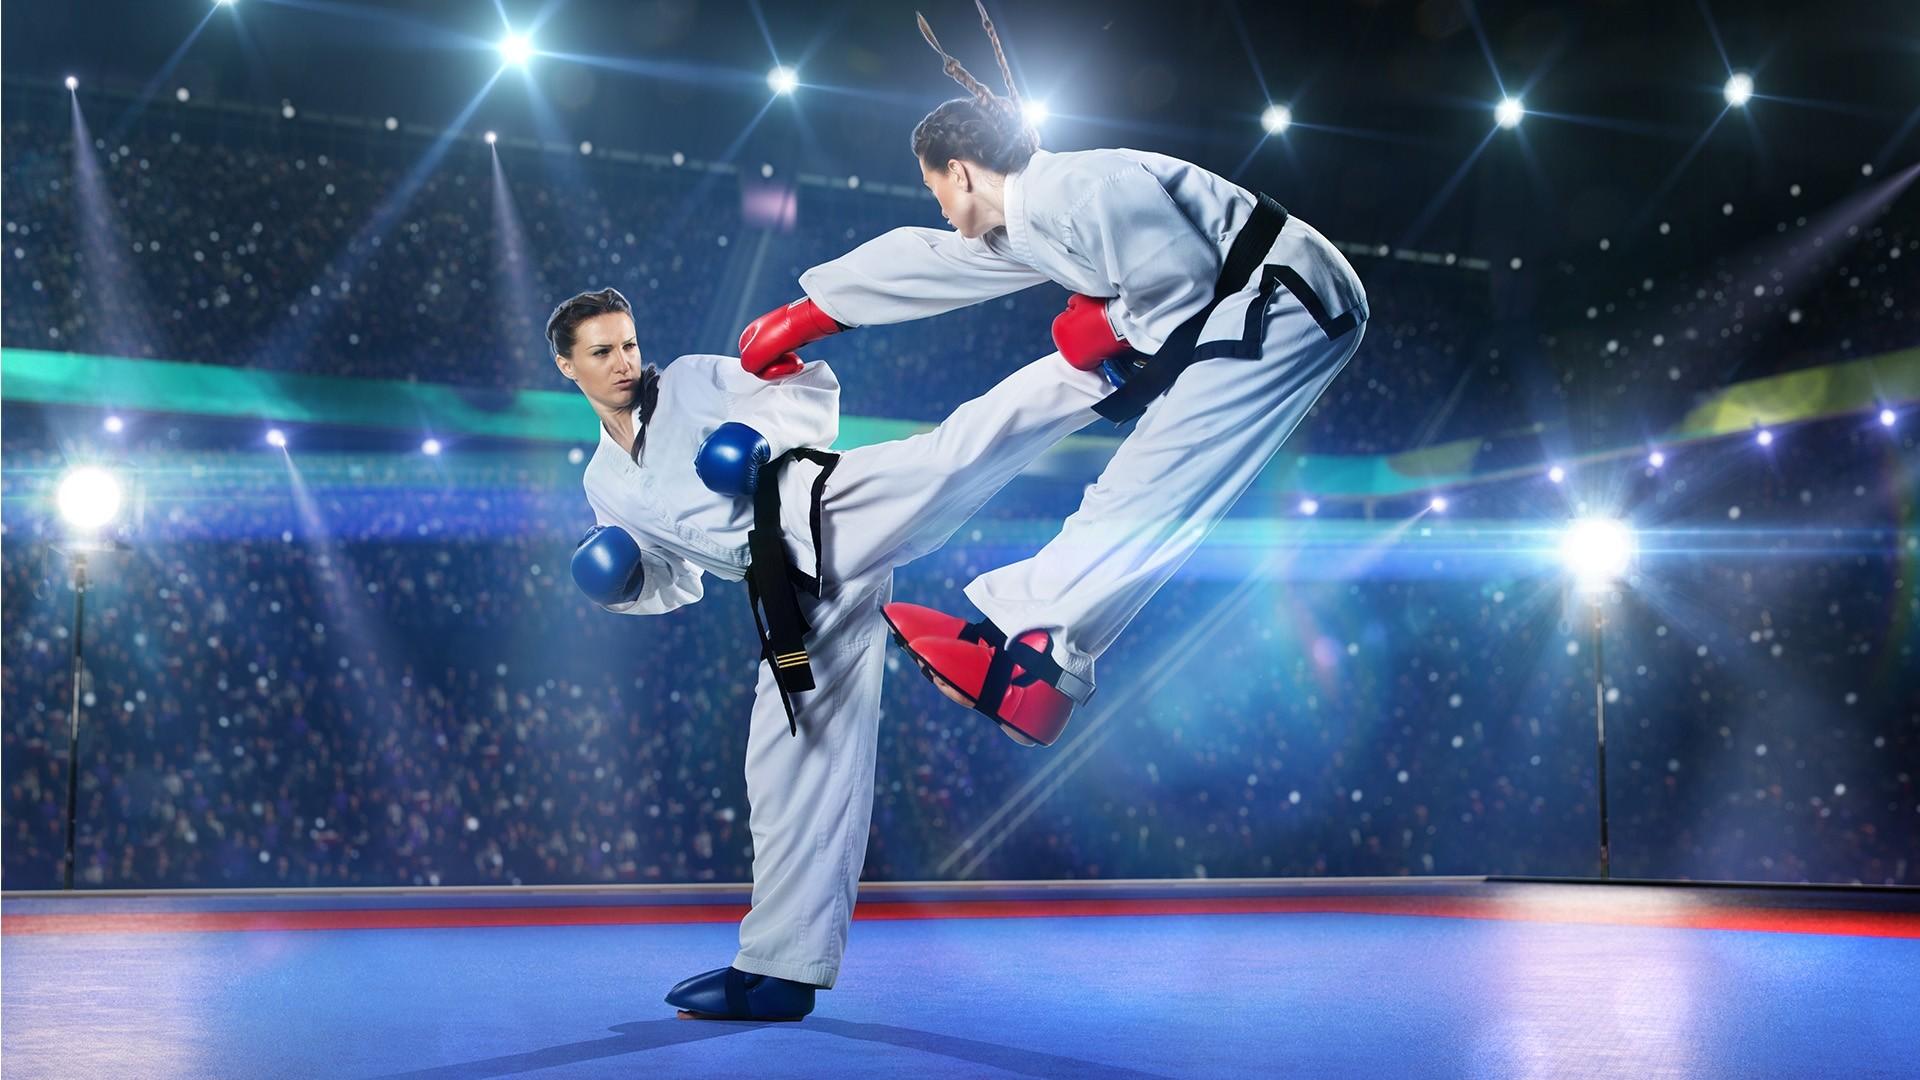 Karate PC Wallpaper